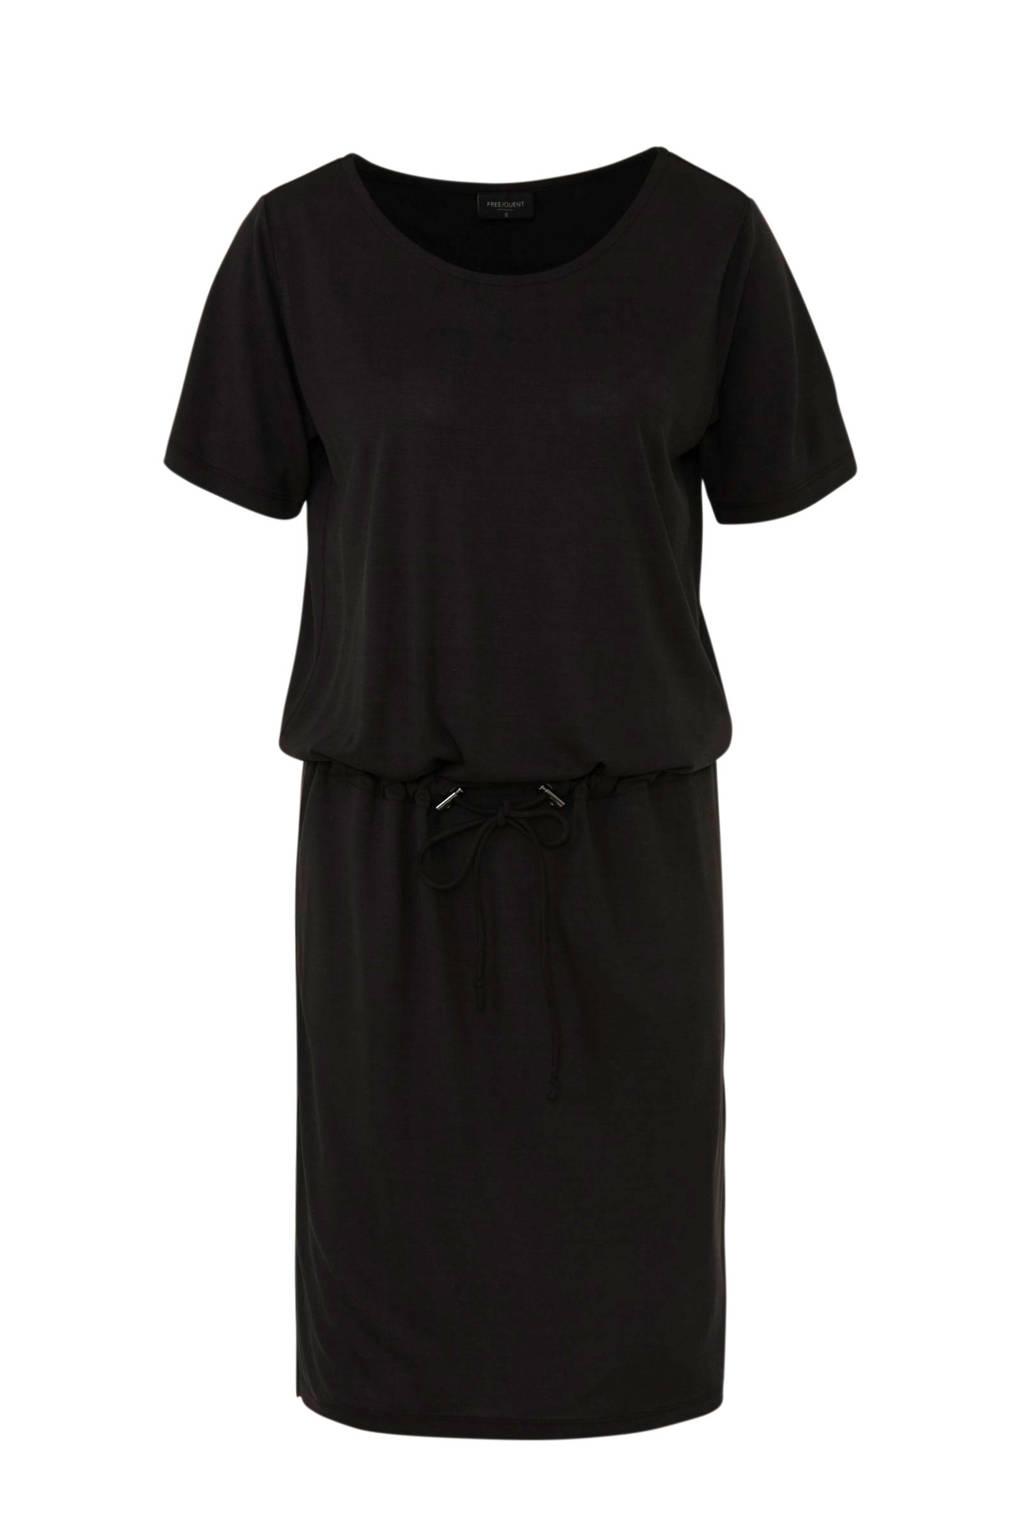 FREEQUENT jurk zwart, Zwart